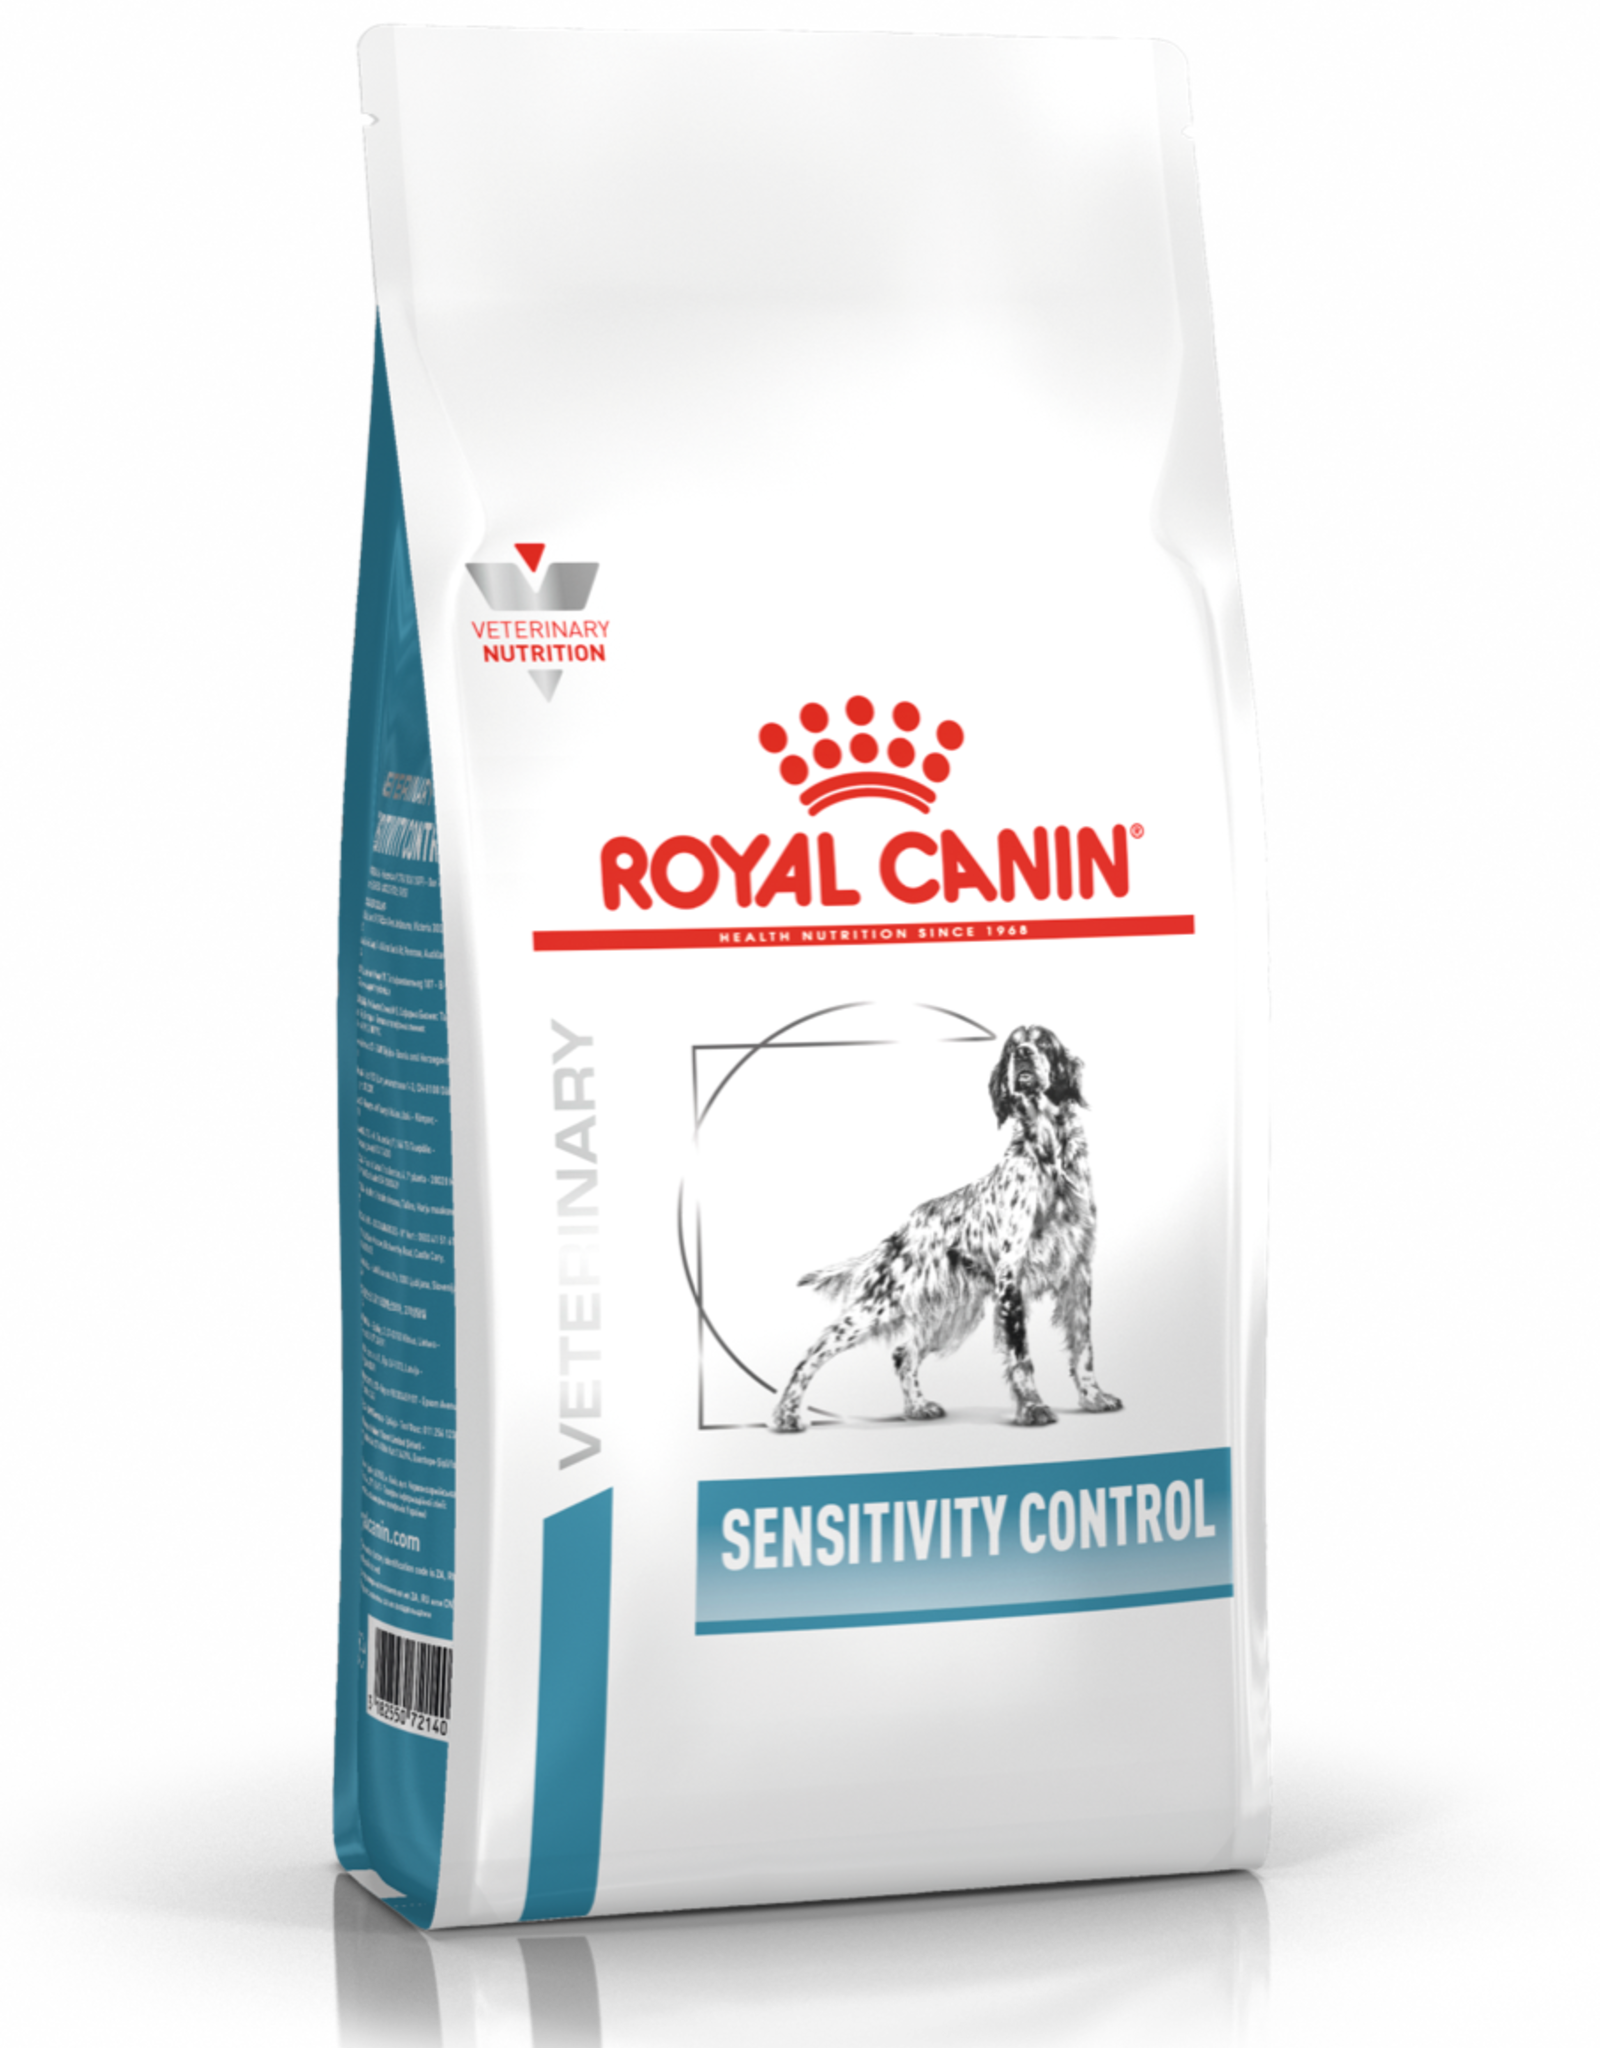 Royal Canin Royal Canin Sensitivity Control Hond Eend 1,5kg